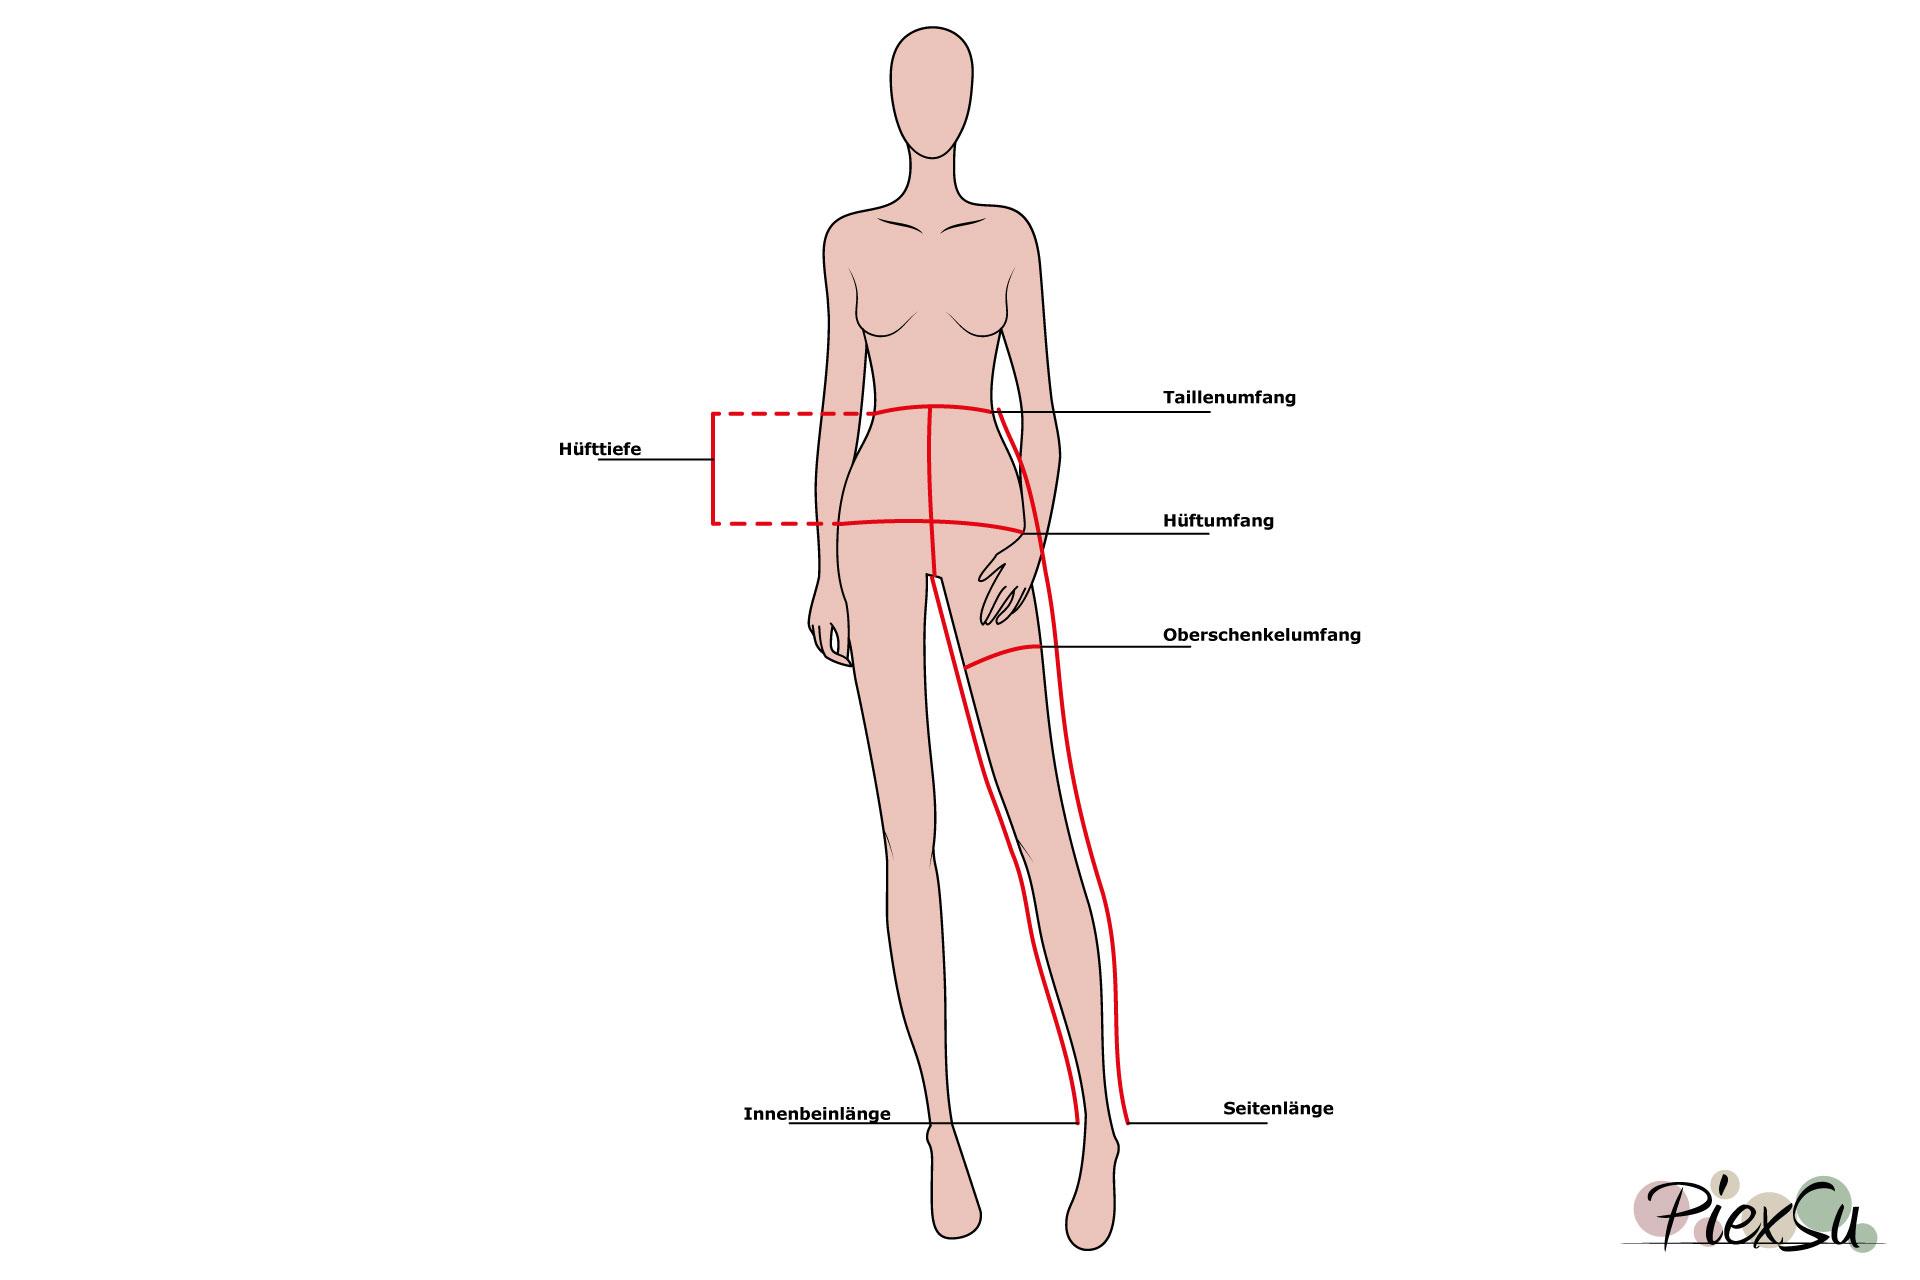 PiexSu-Maß-nehmen-messen-Schnittmuster-nähen-Nähanleitung-Maße-für-Hosen-quer-Titelbild